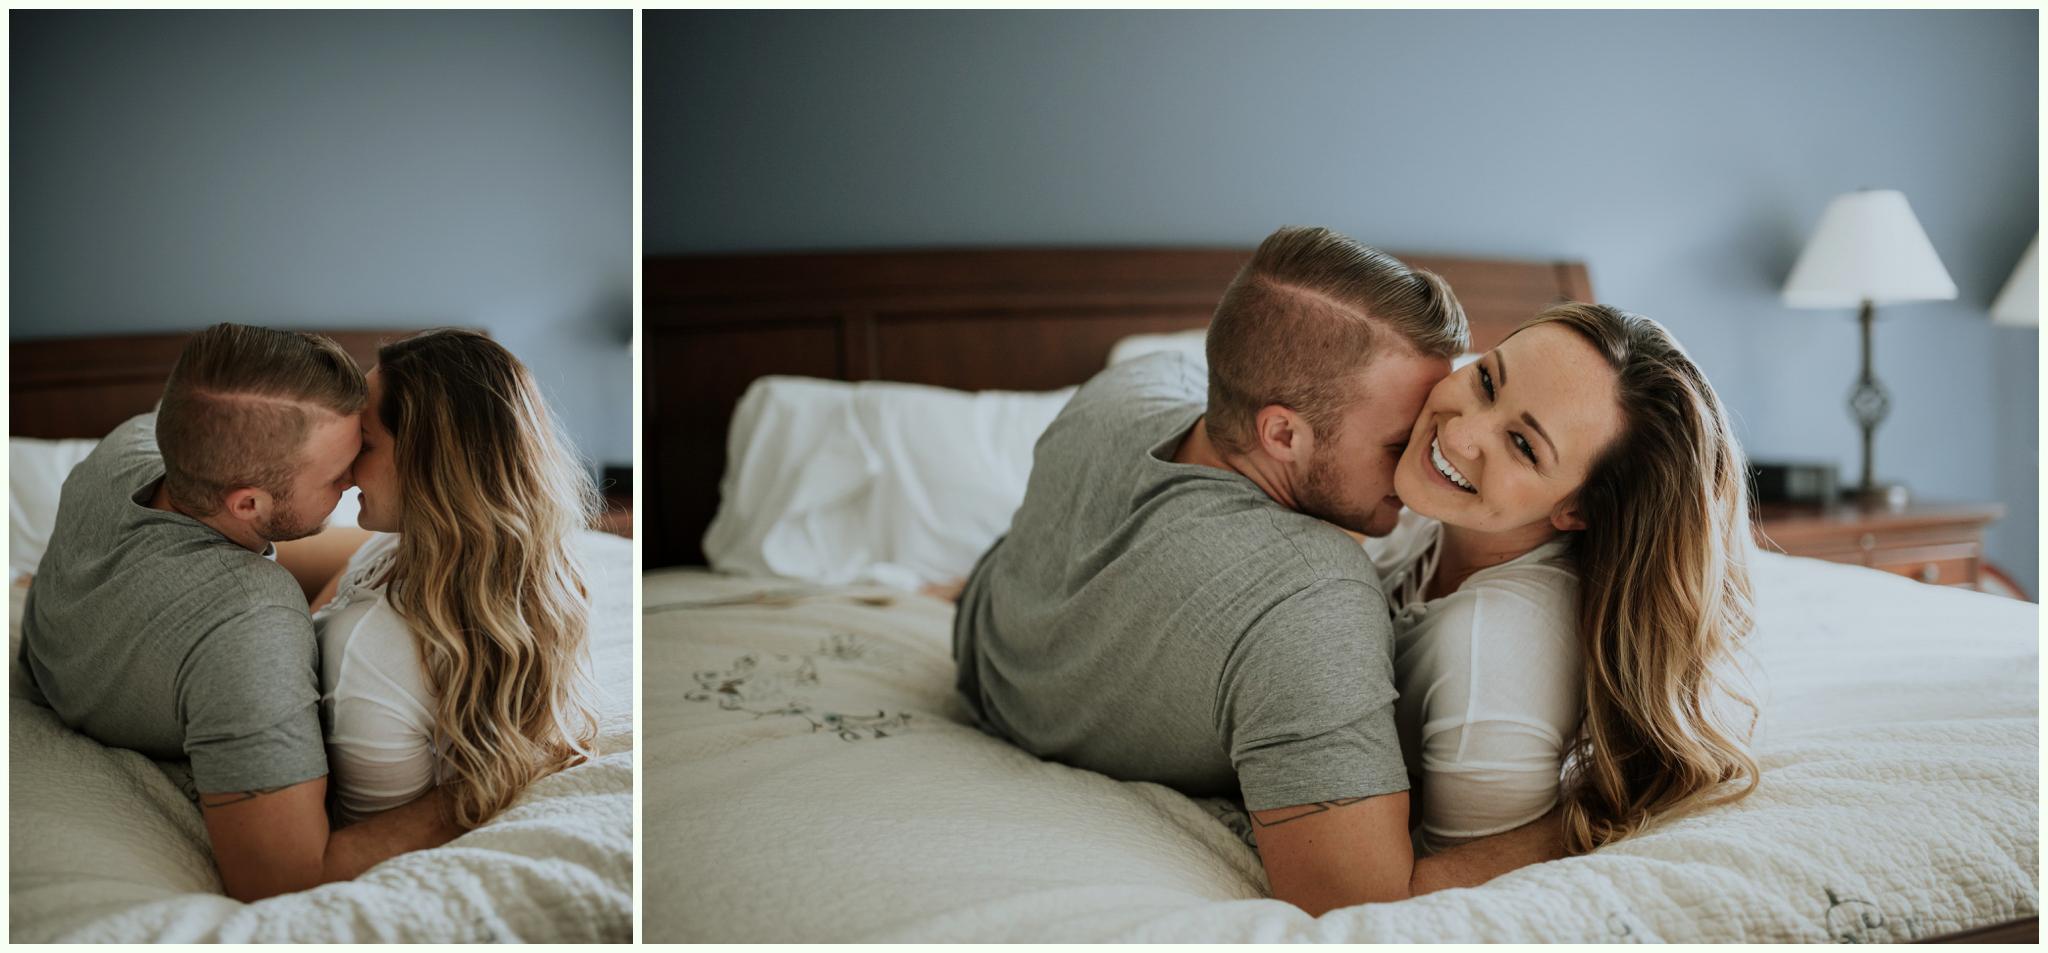 in-home-engagement-session-seattle-wedding-photographer-caitlyn-nikula-18.jpg